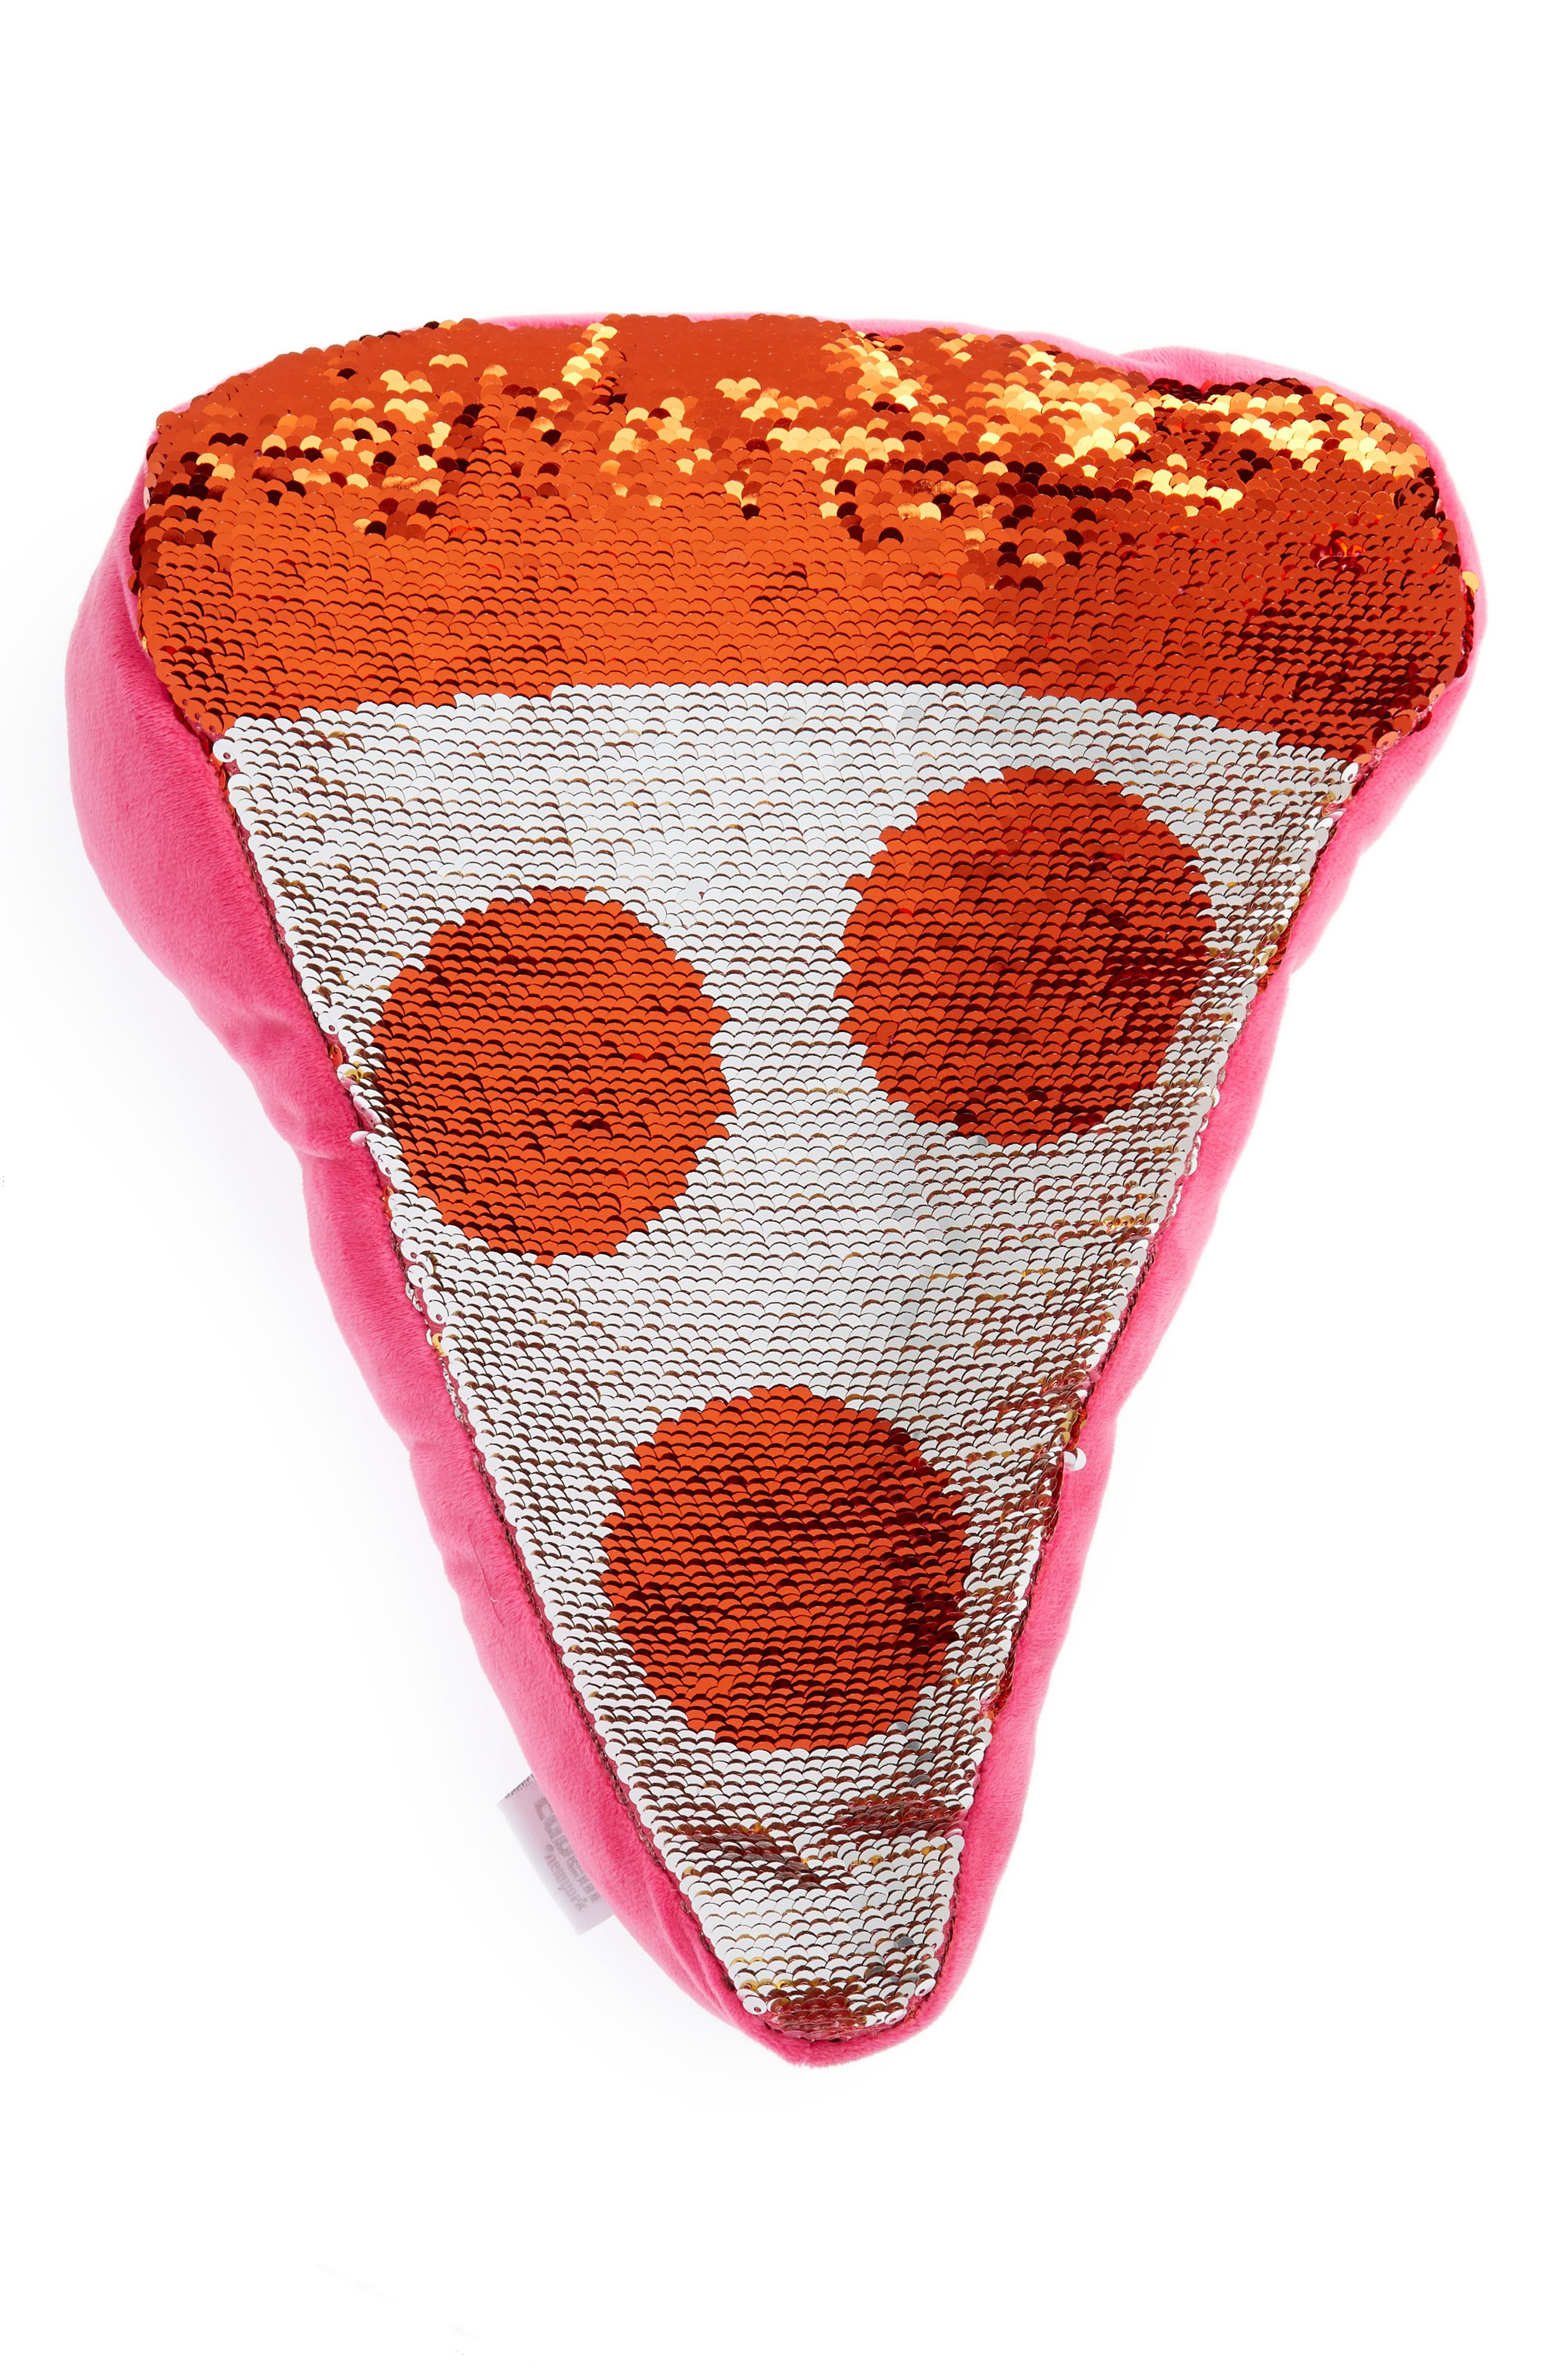 Flip Sequin Pizza Slice Pillow,                             Alternate thumbnail 4, color,                             659